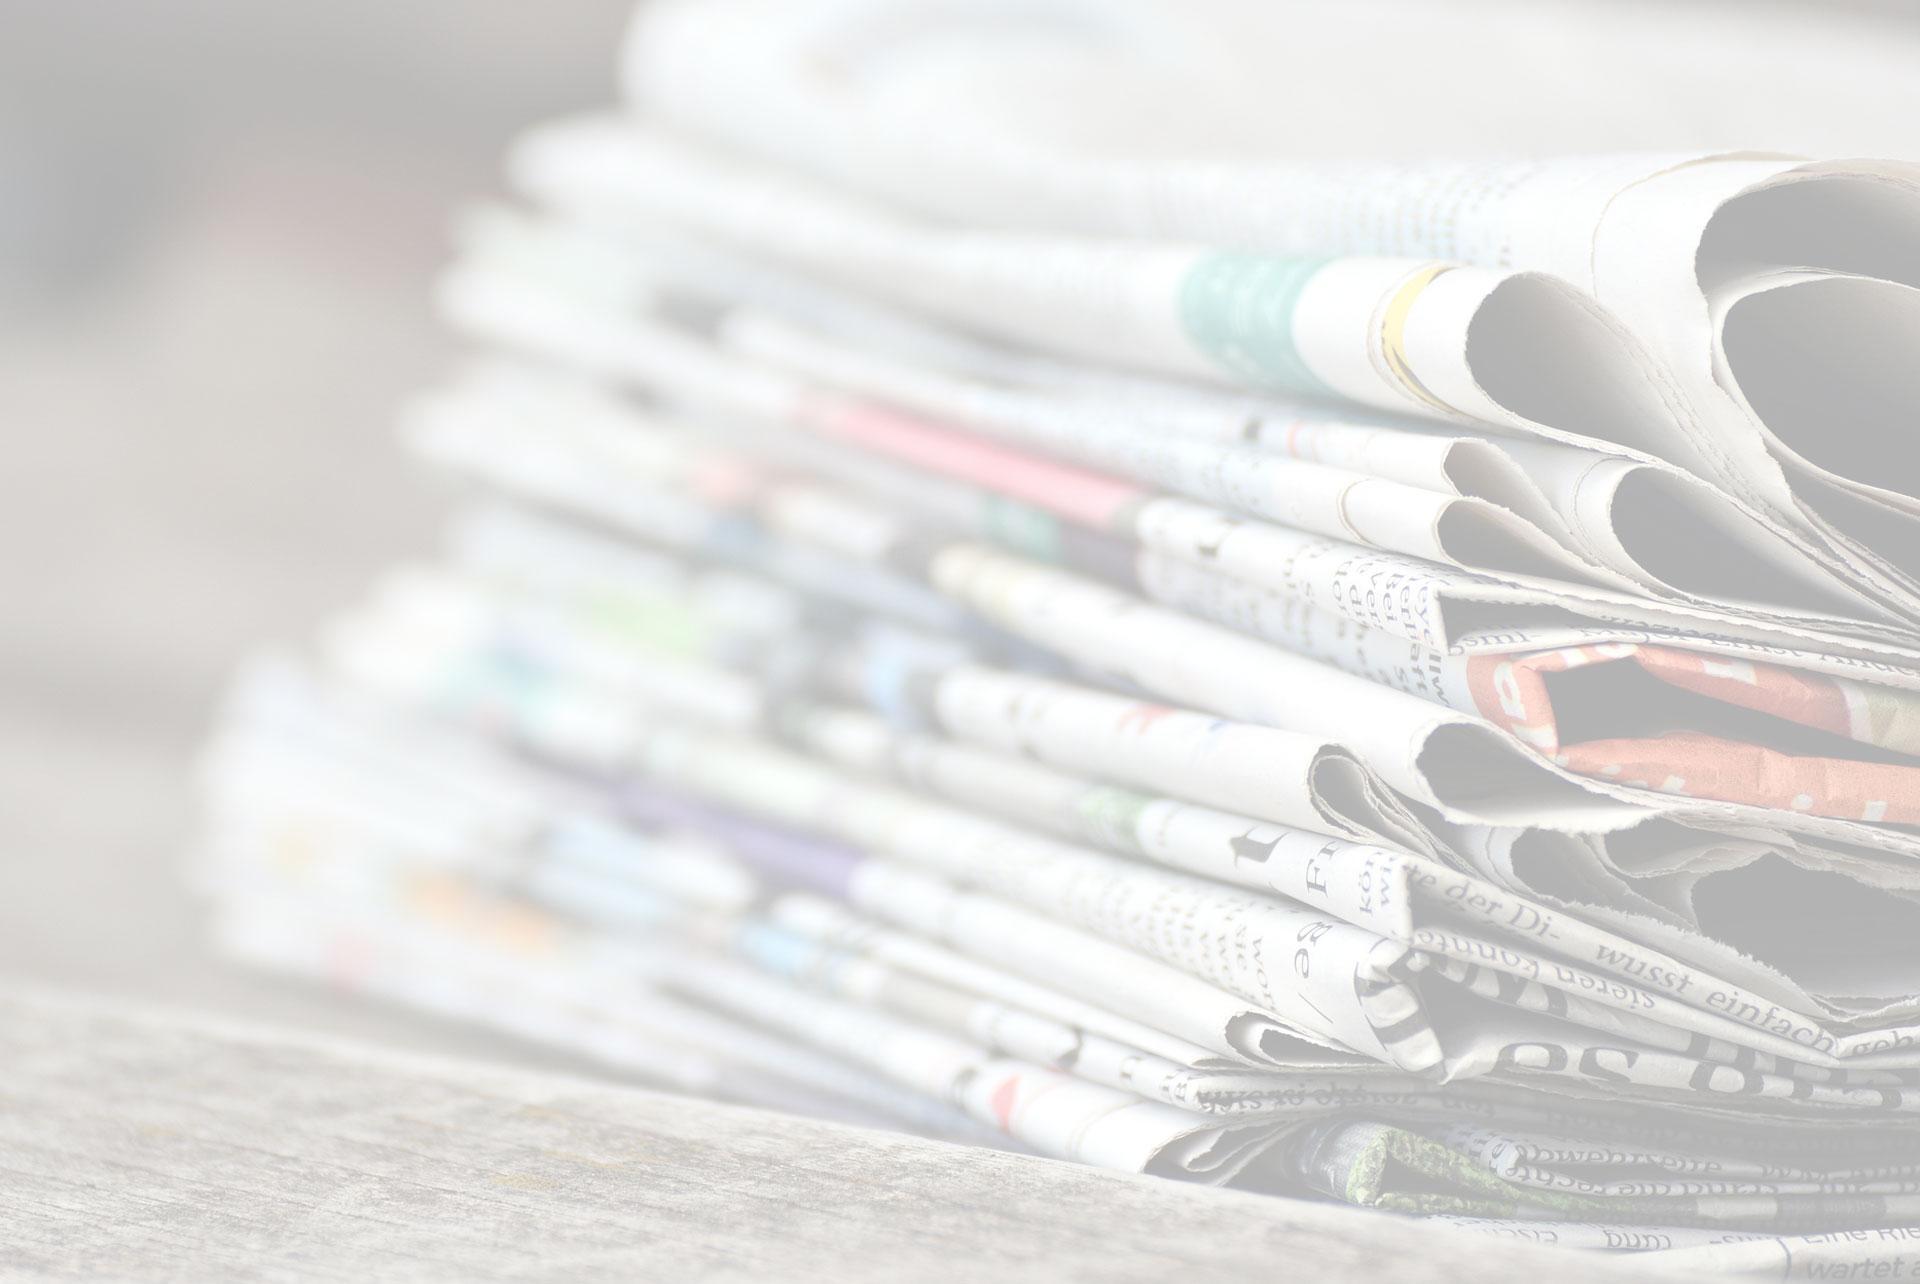 Greta Thunberg Torino